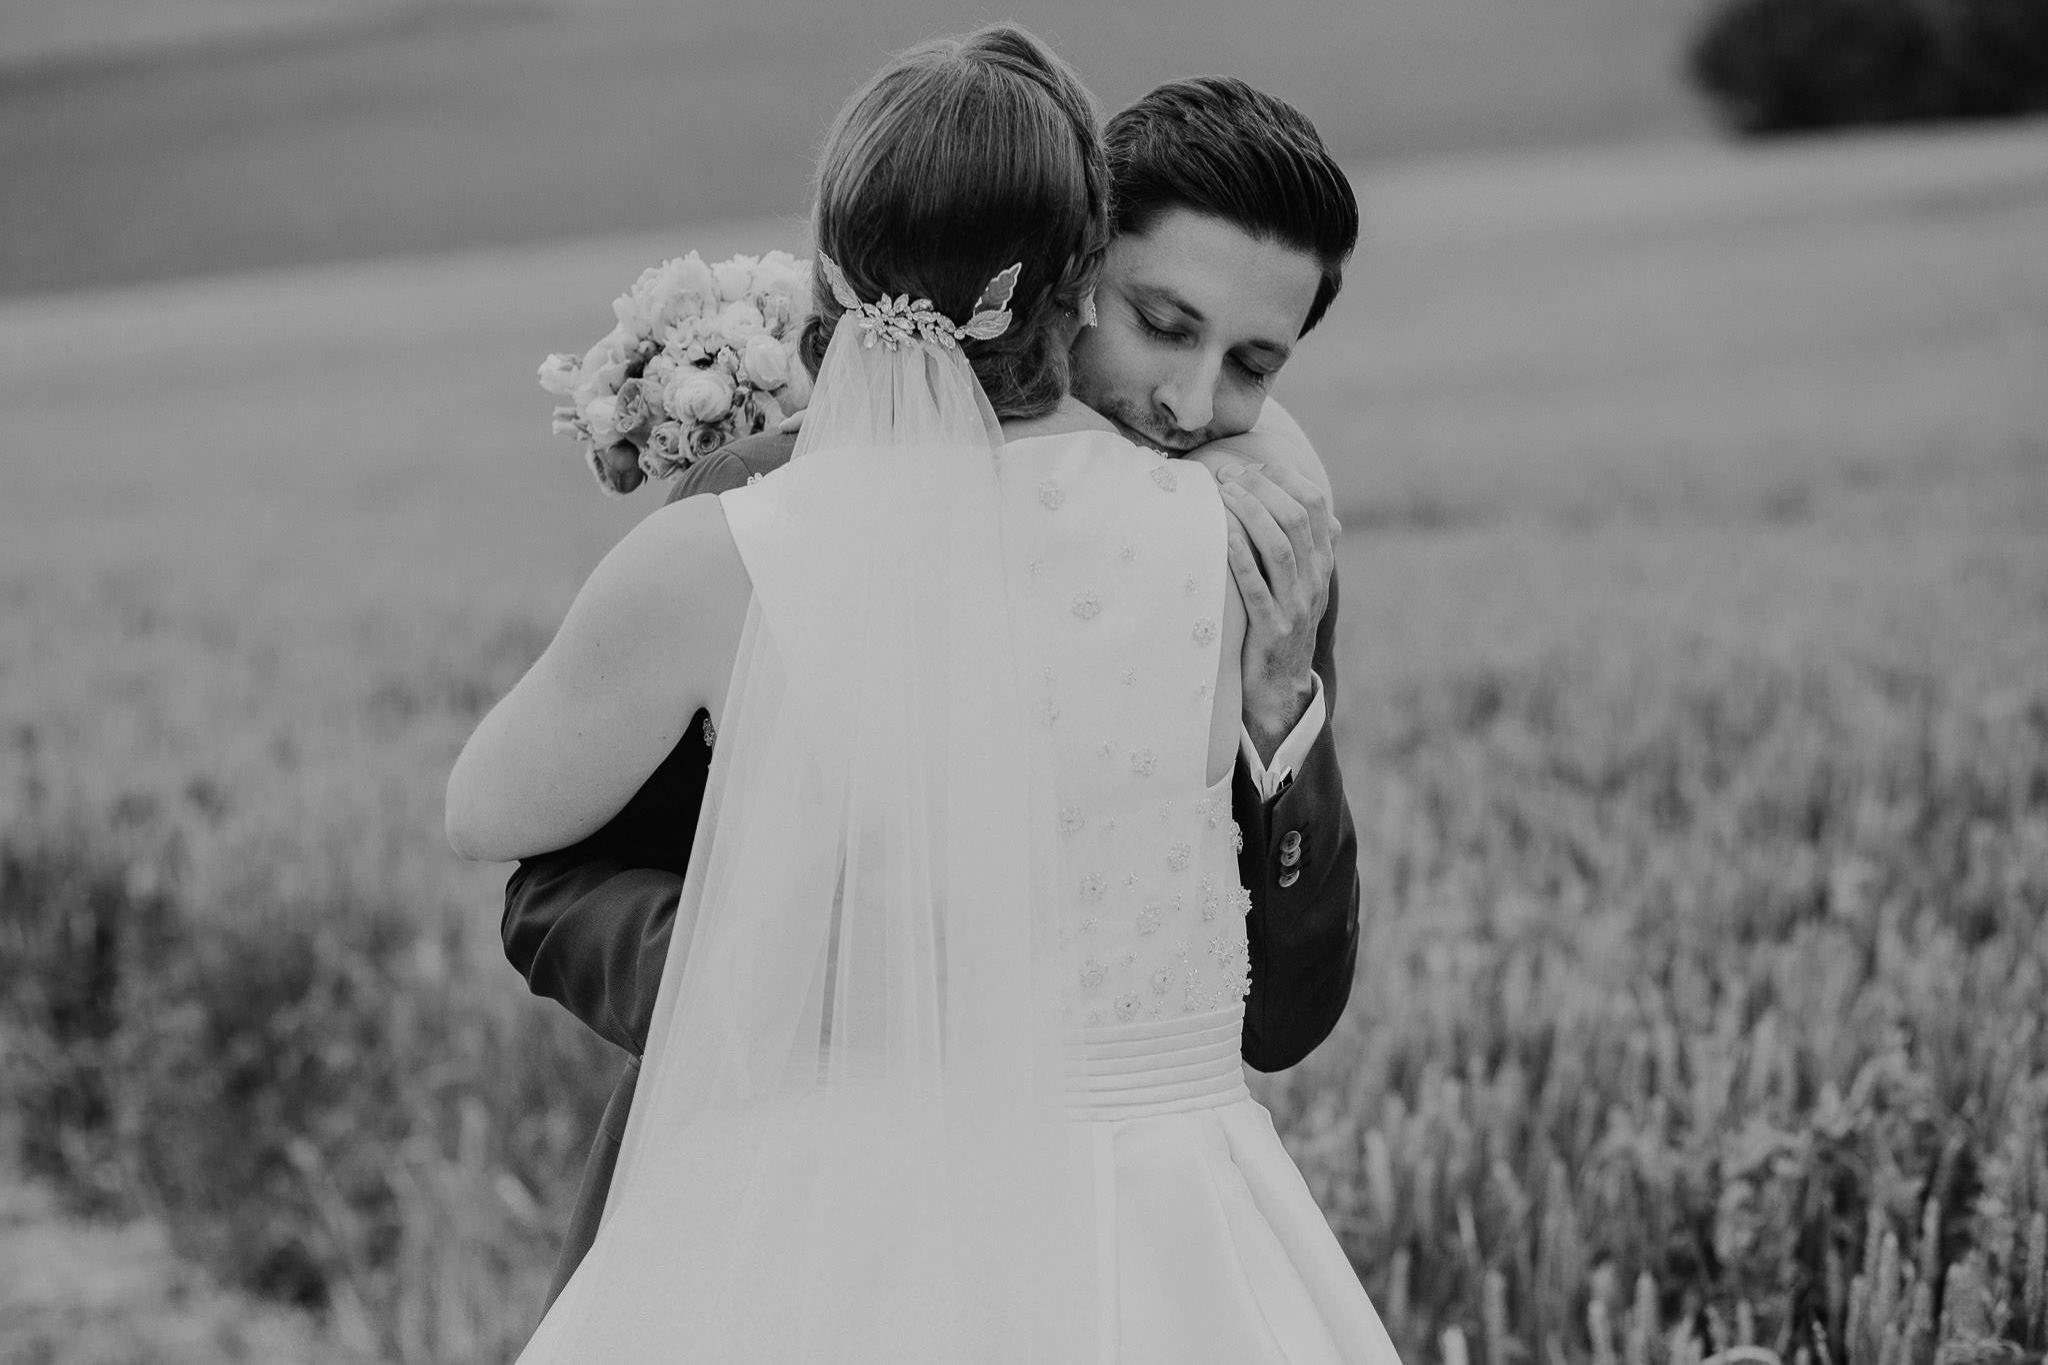 wedding photographer hamilton new zealand 1017 5